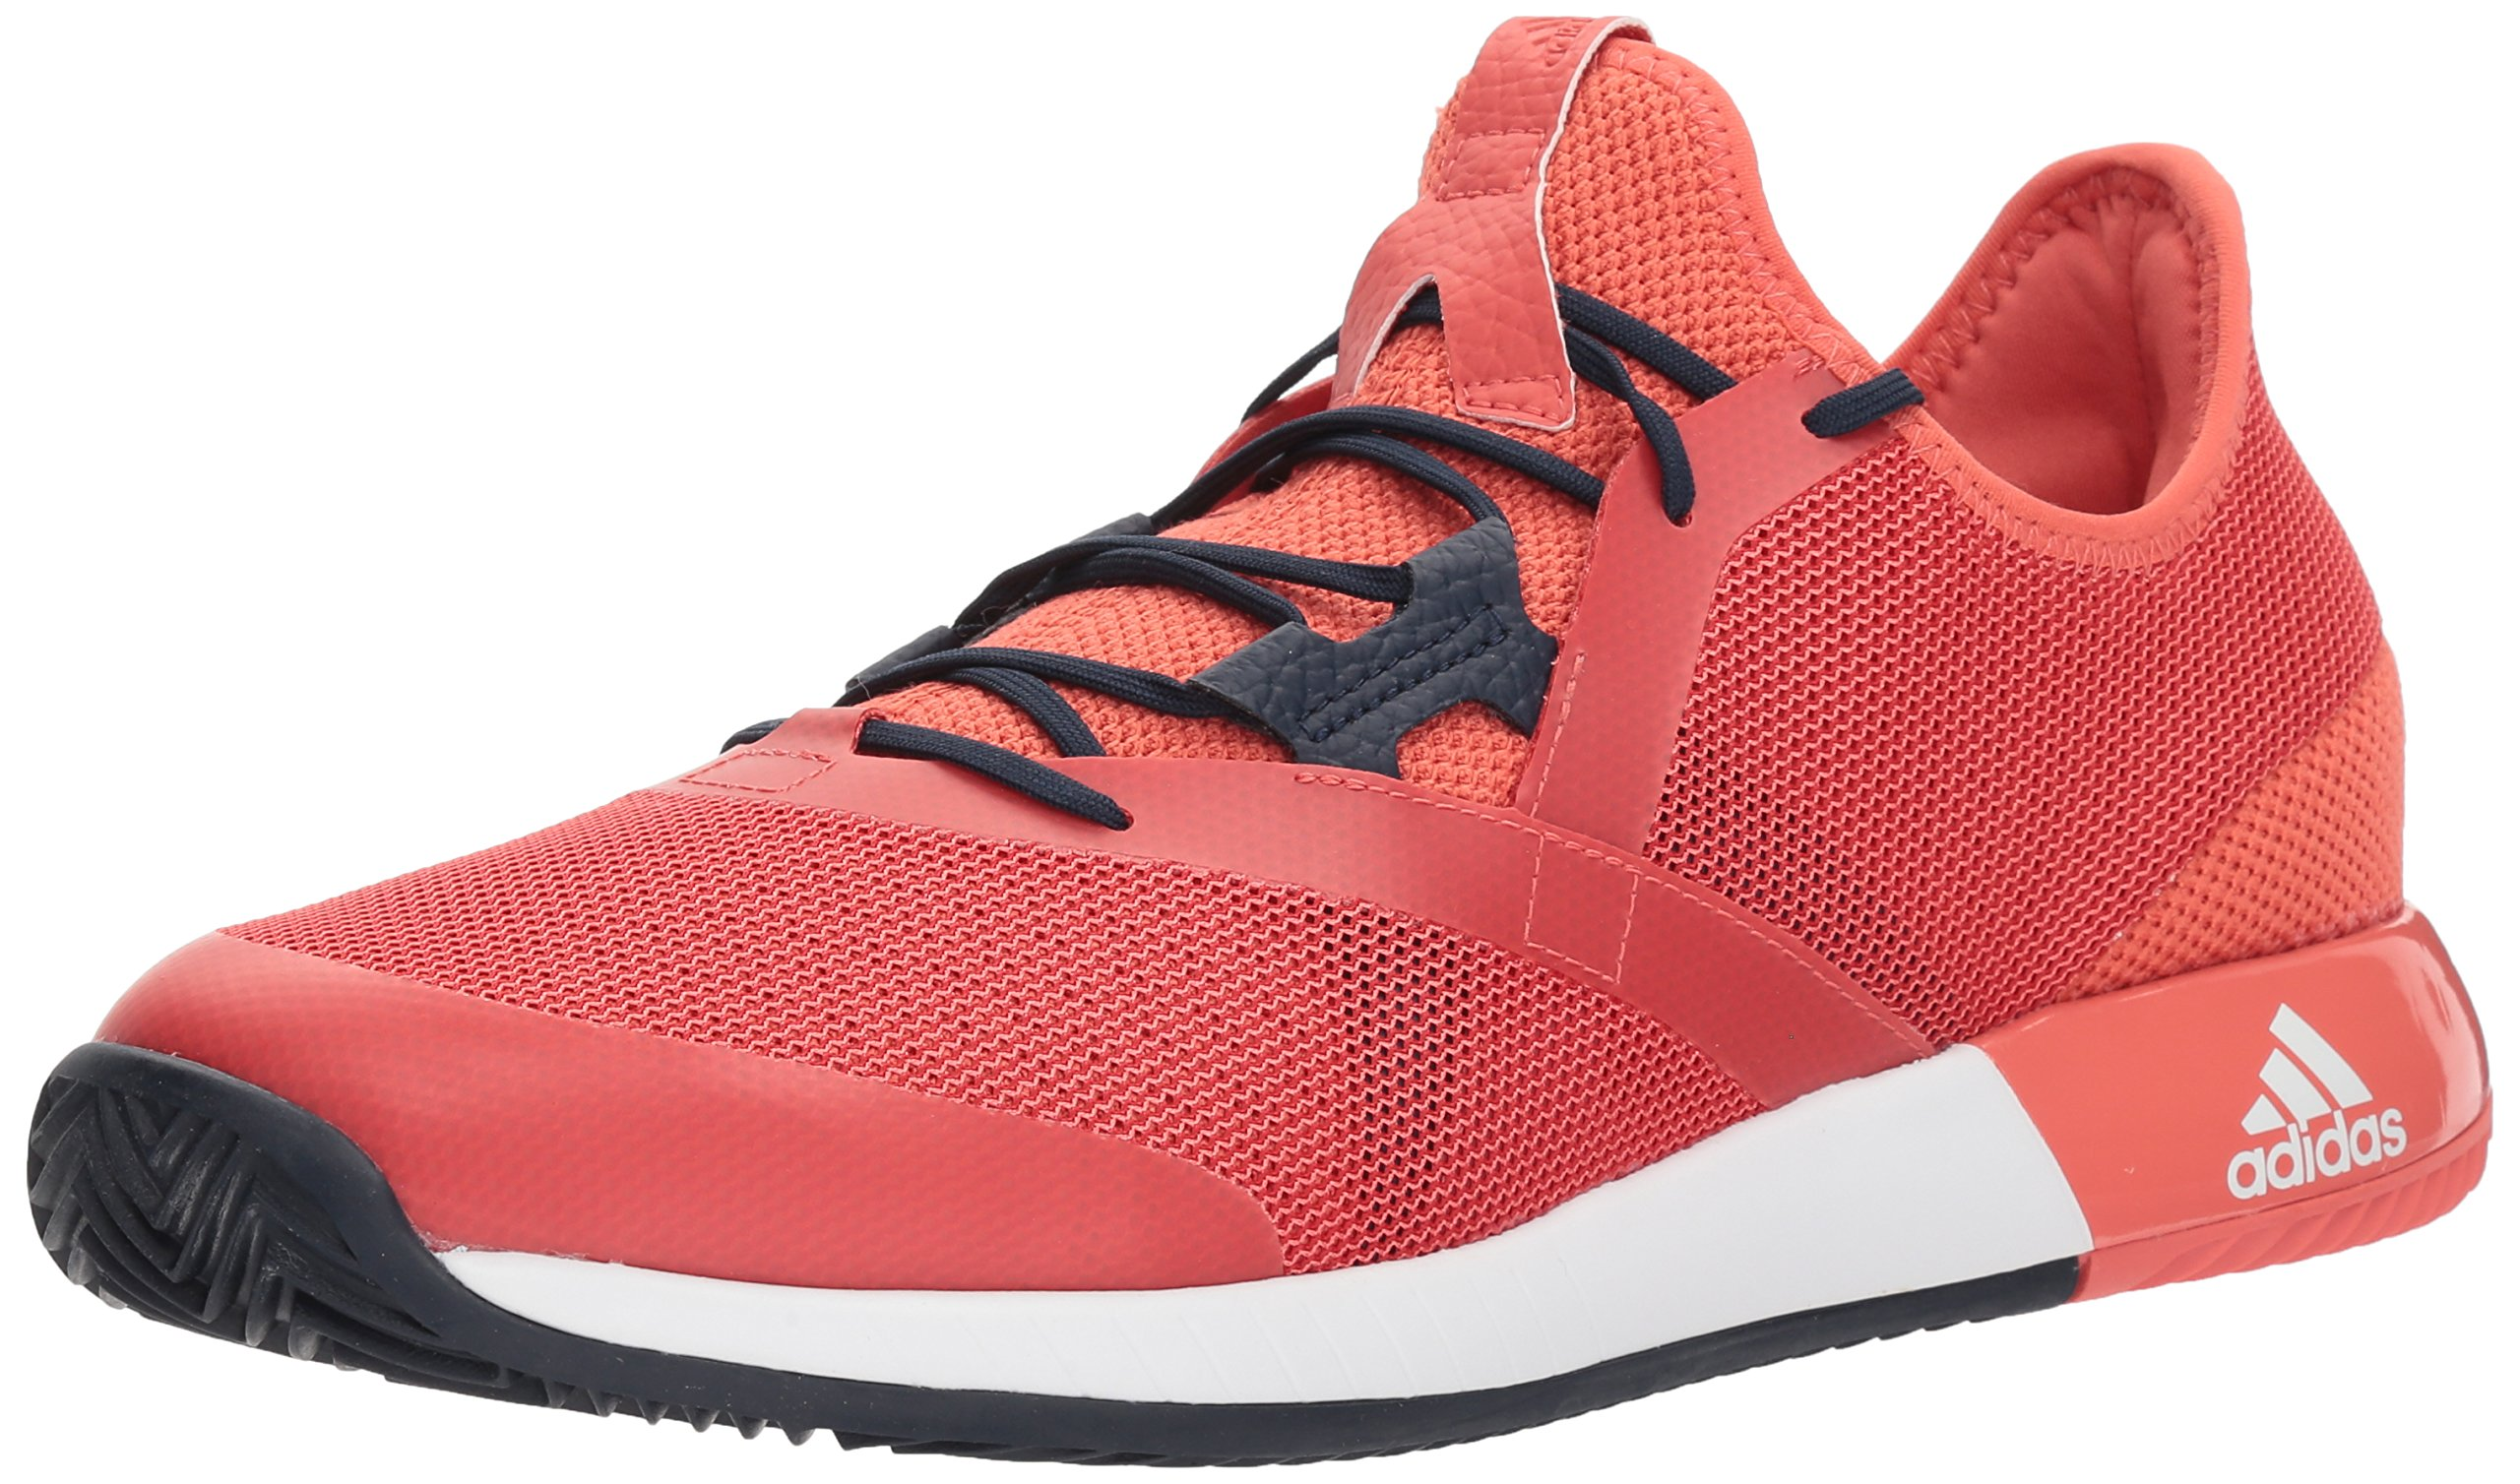 adidas Men's Adizero Defiant Bounce Tennis Shoe, Trace Scarlet/White/Night Navy, 10 M US